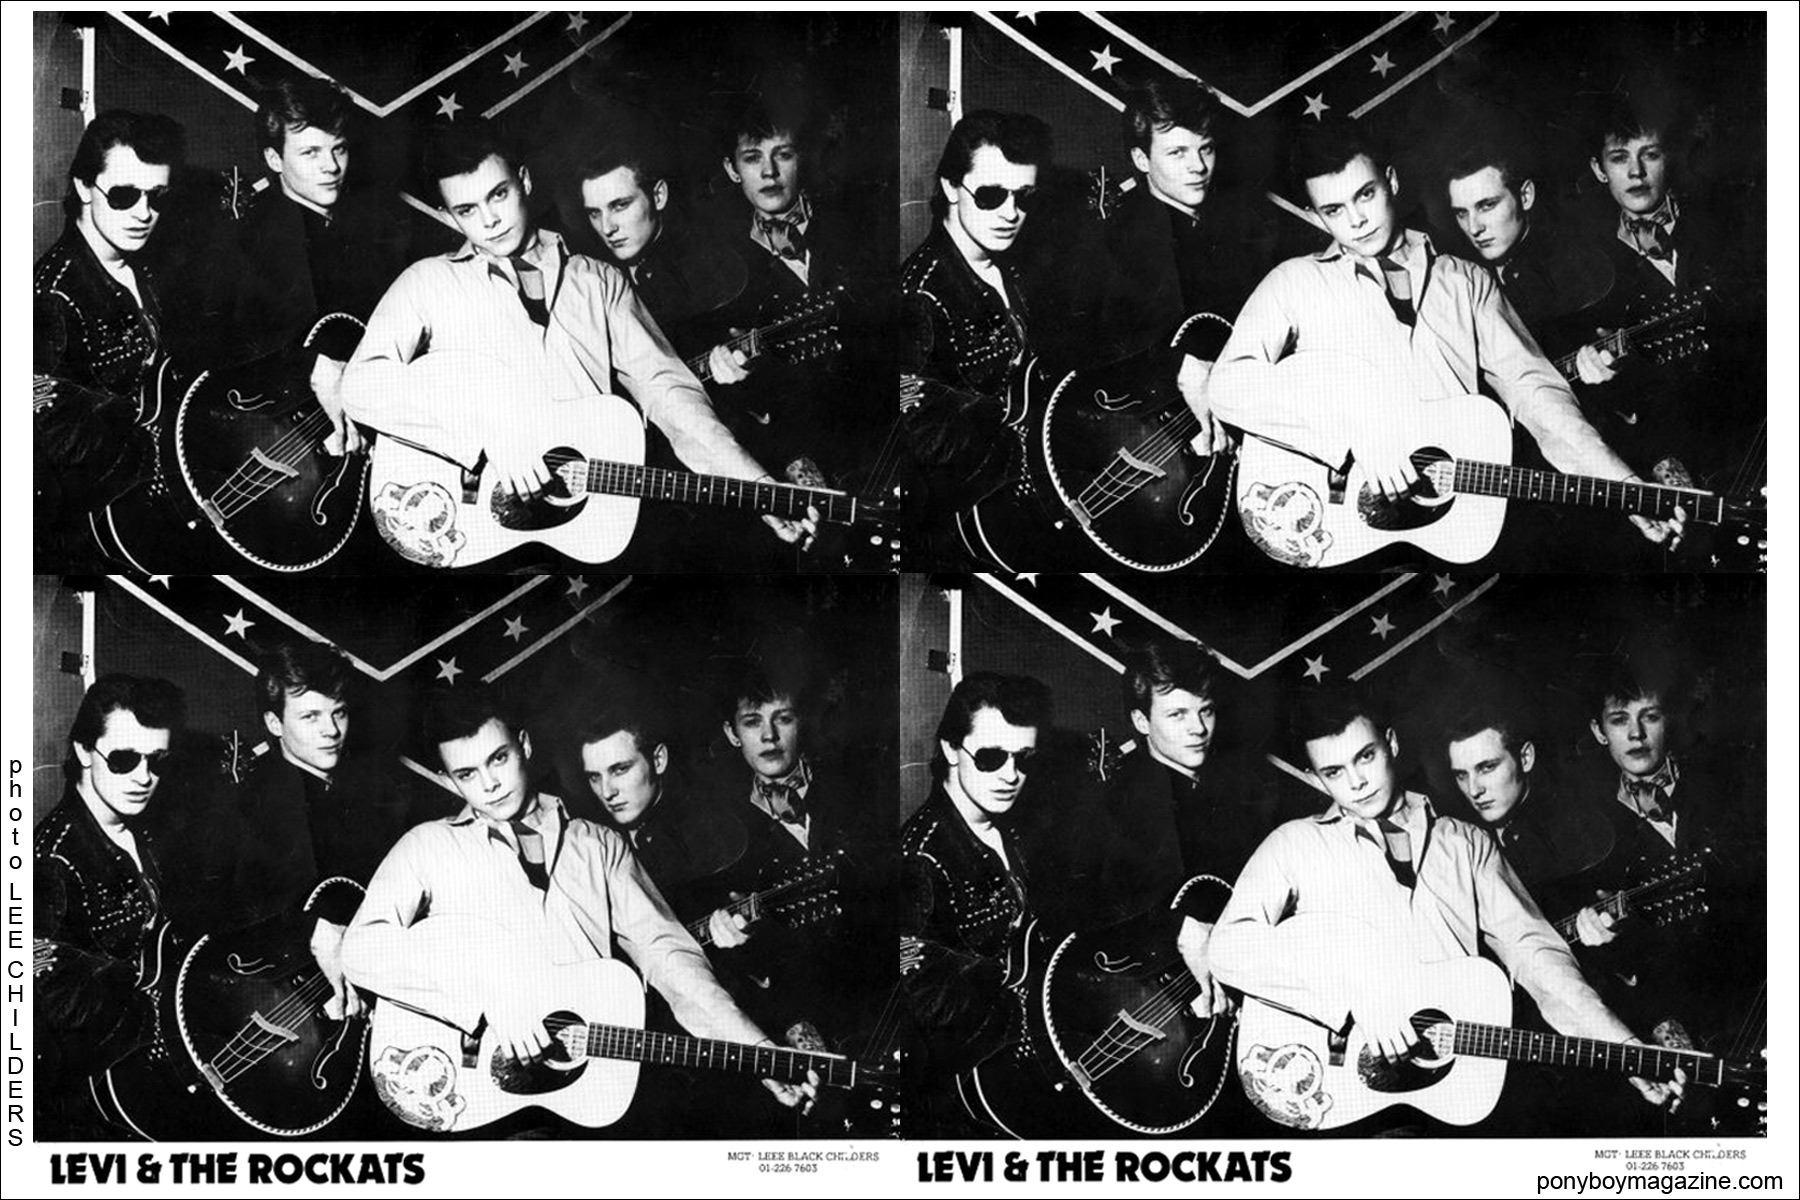 B&W band photo of Levi & The Rockats by Lee Childers, Ponyboy Magazine.